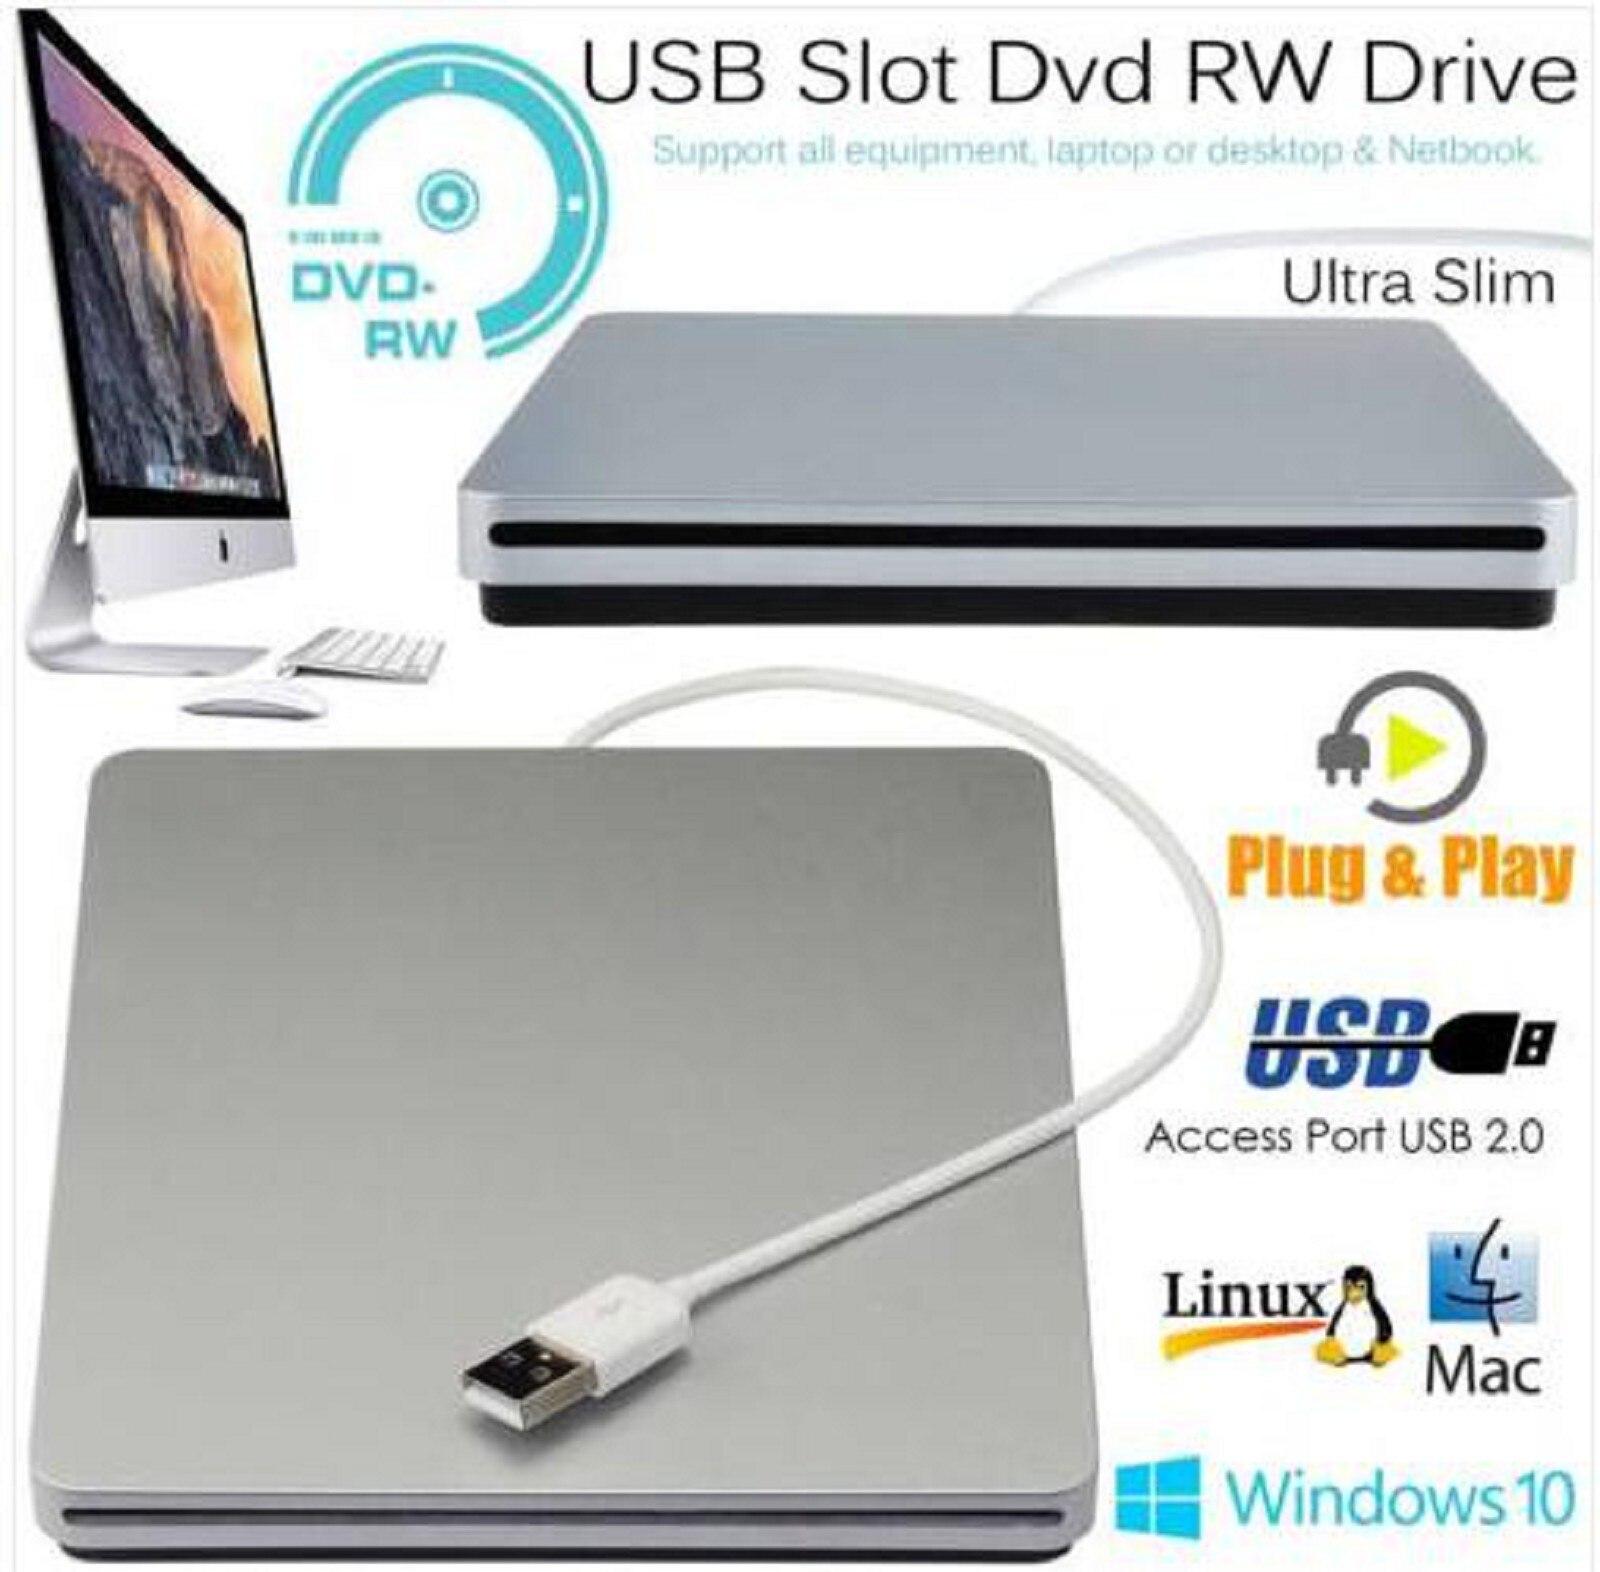 USB2.0 Slim External  DVD Drive CD Writer Burner Disk Reader Player DVD ROM Optical Drive For Mac OS/WindowsME/2000/XP/Vista/7